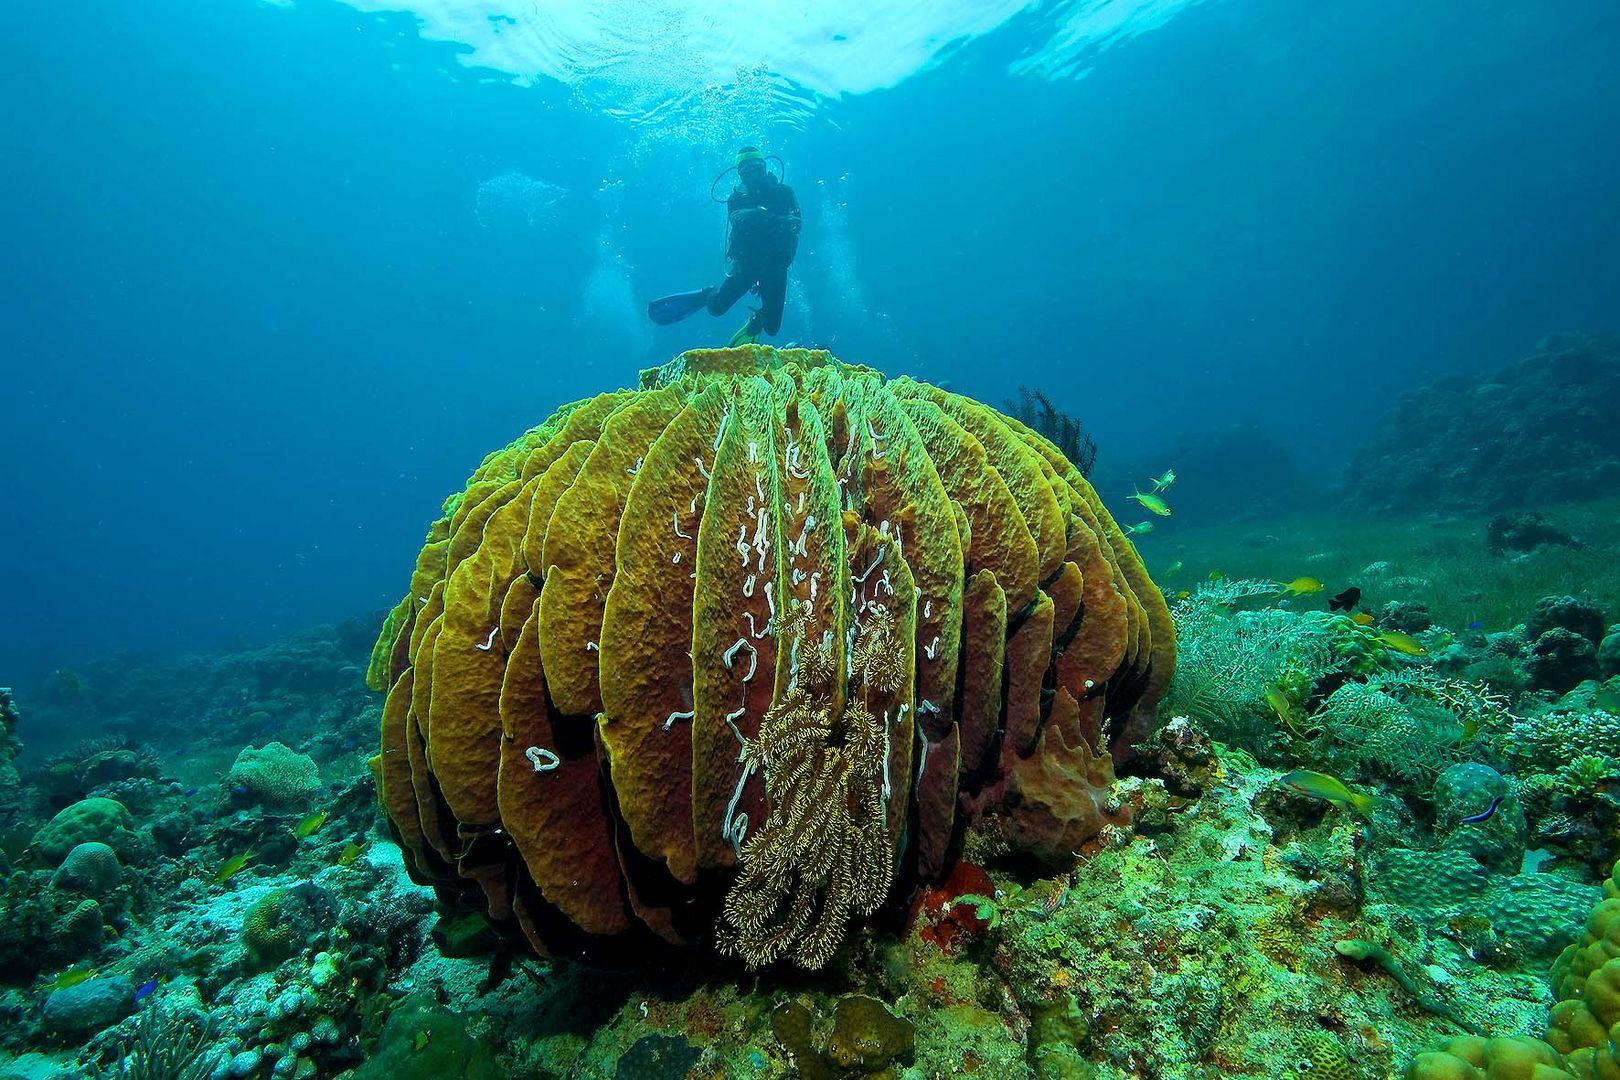 big sponge